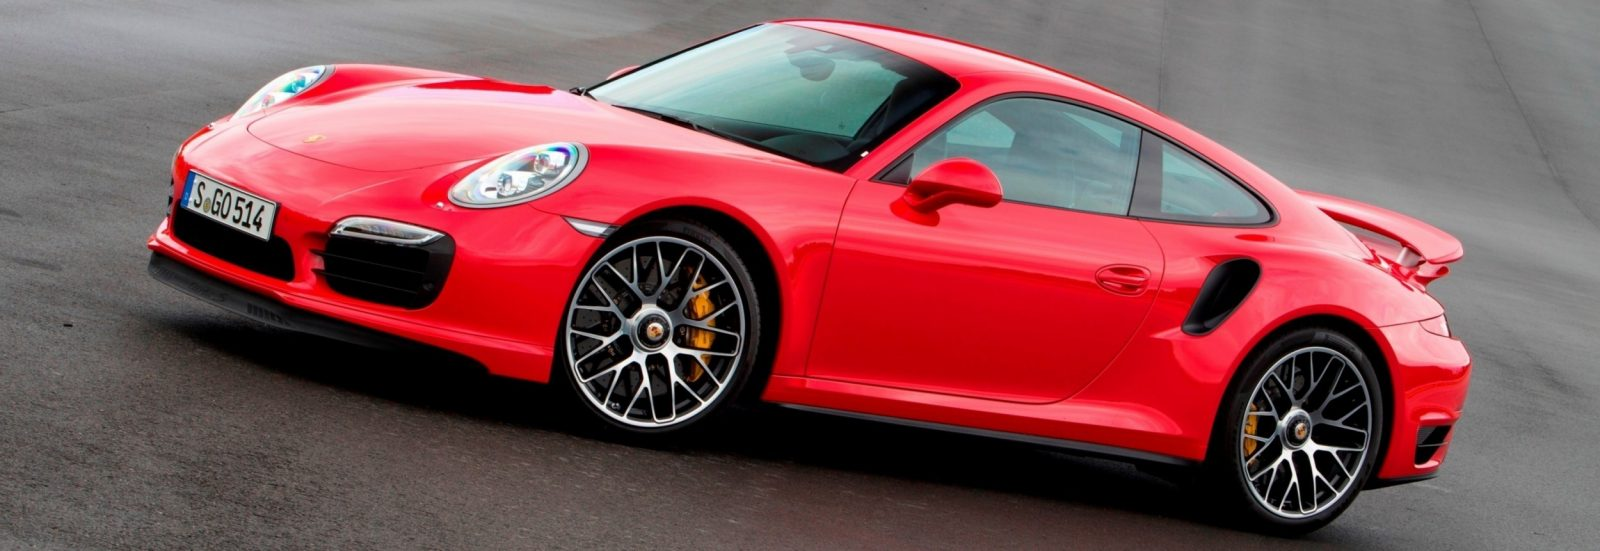 Porsche 911 Turbo S _19_